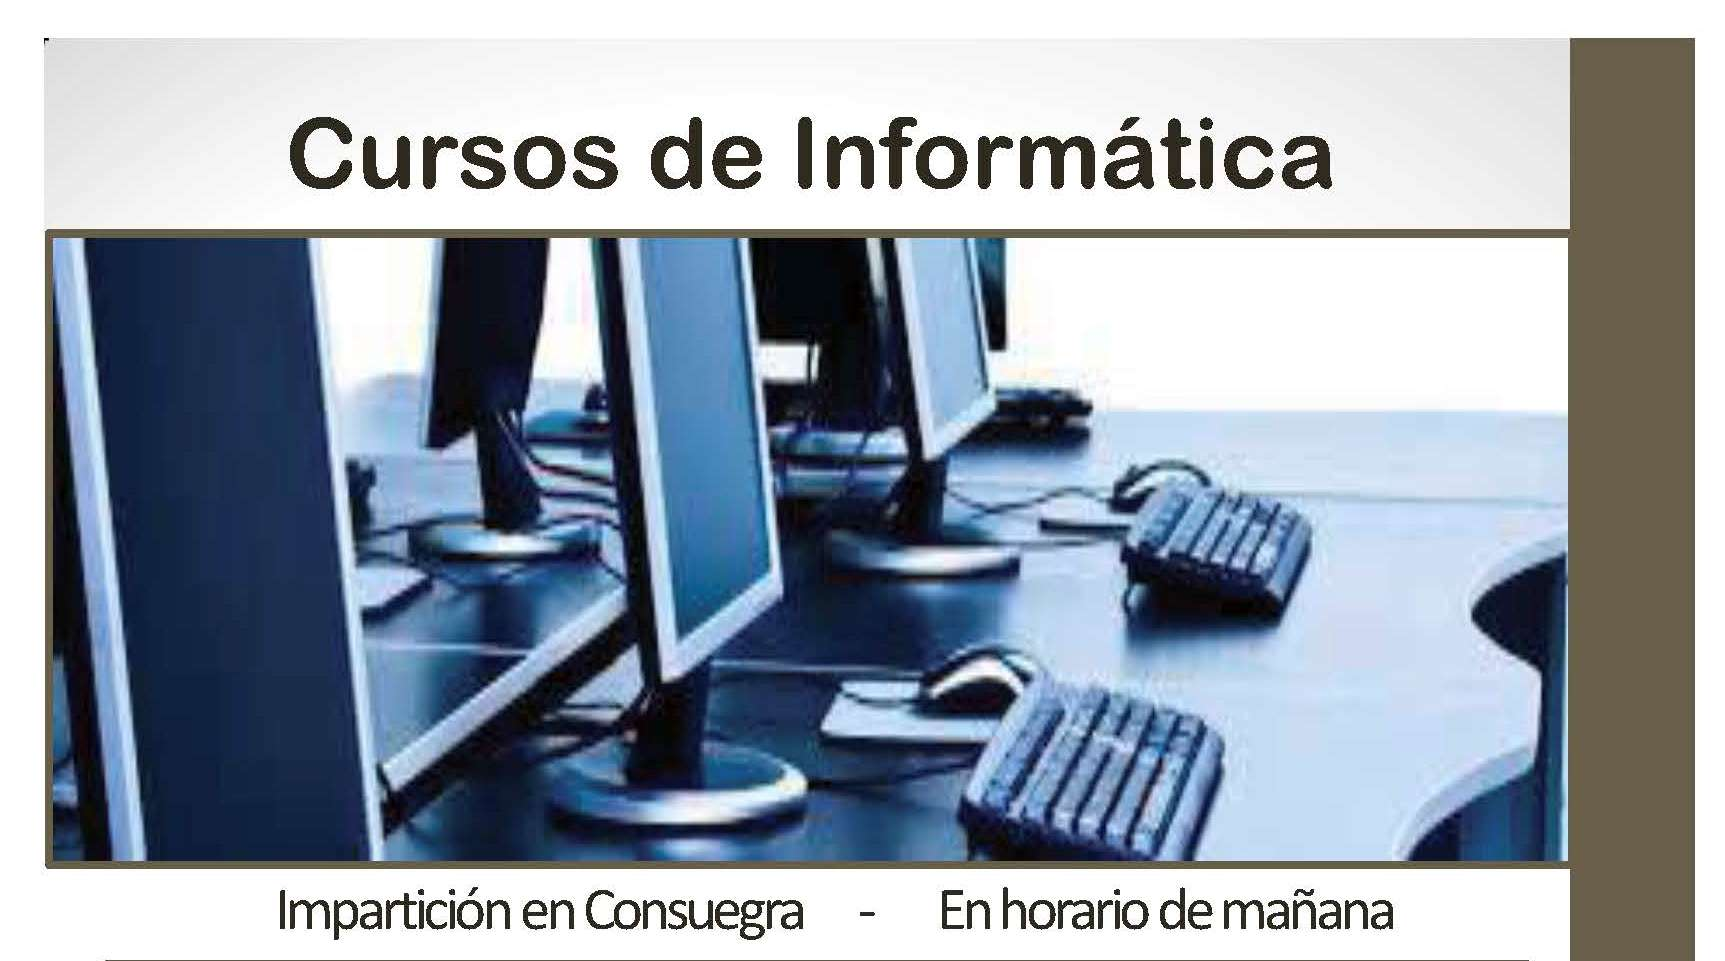 curso-informatica-15-16-14treinta-rec1.jpg - 116.09 KB